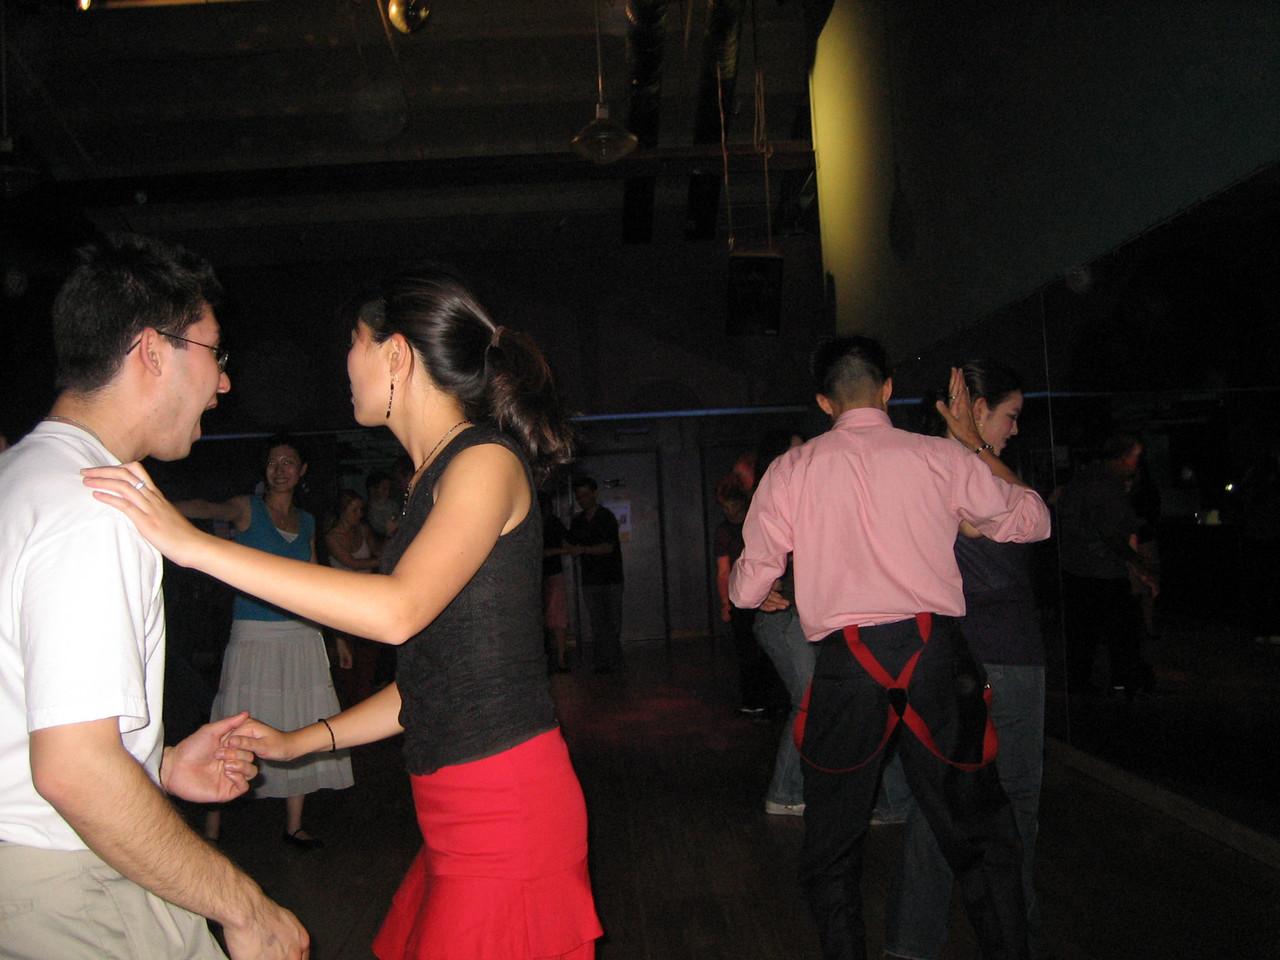 2006 05 12 Fri - Kyle Lesler, Tiffany Louie, Ben Yu, & Kim